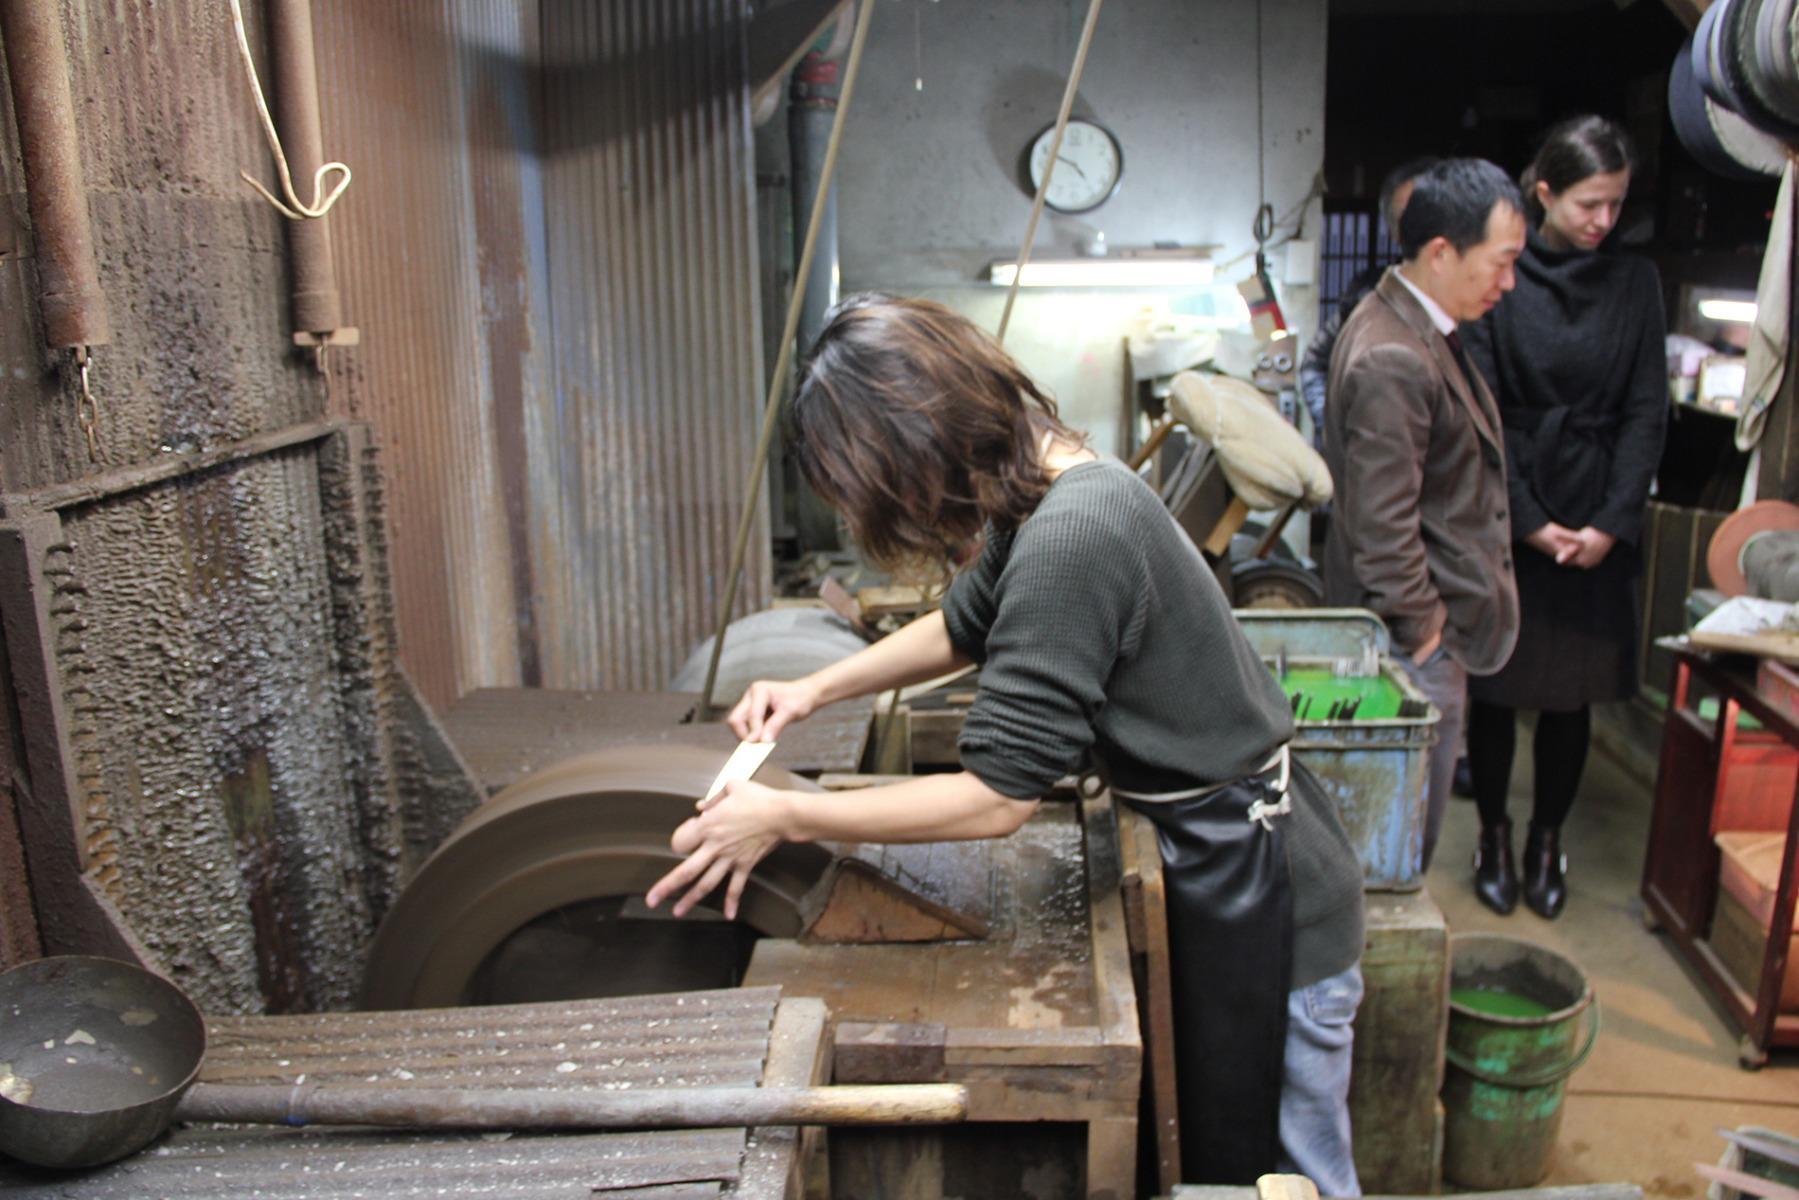 Knife wheel grid sharpening Japan